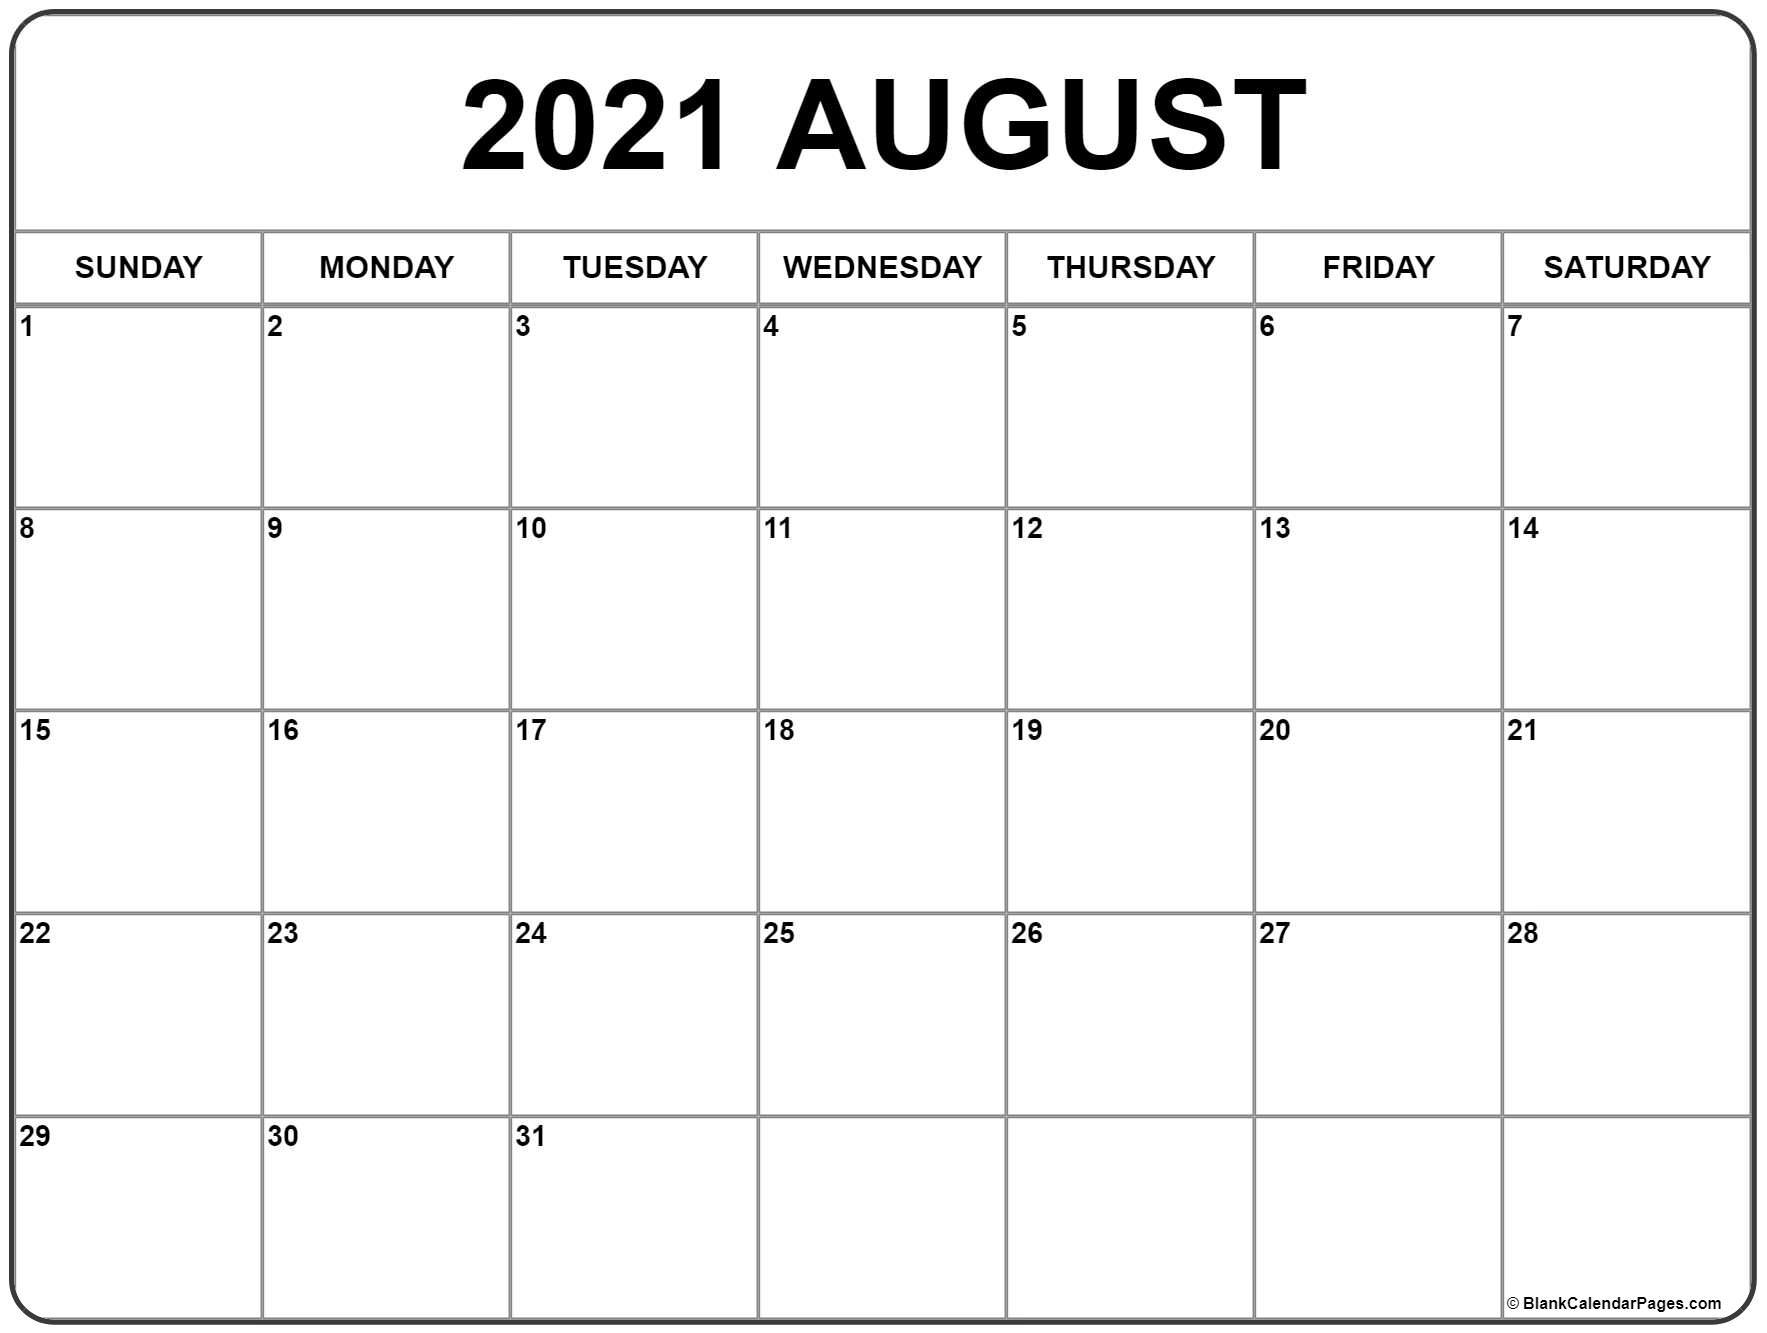 Catch August 2021 Calendar Pdf